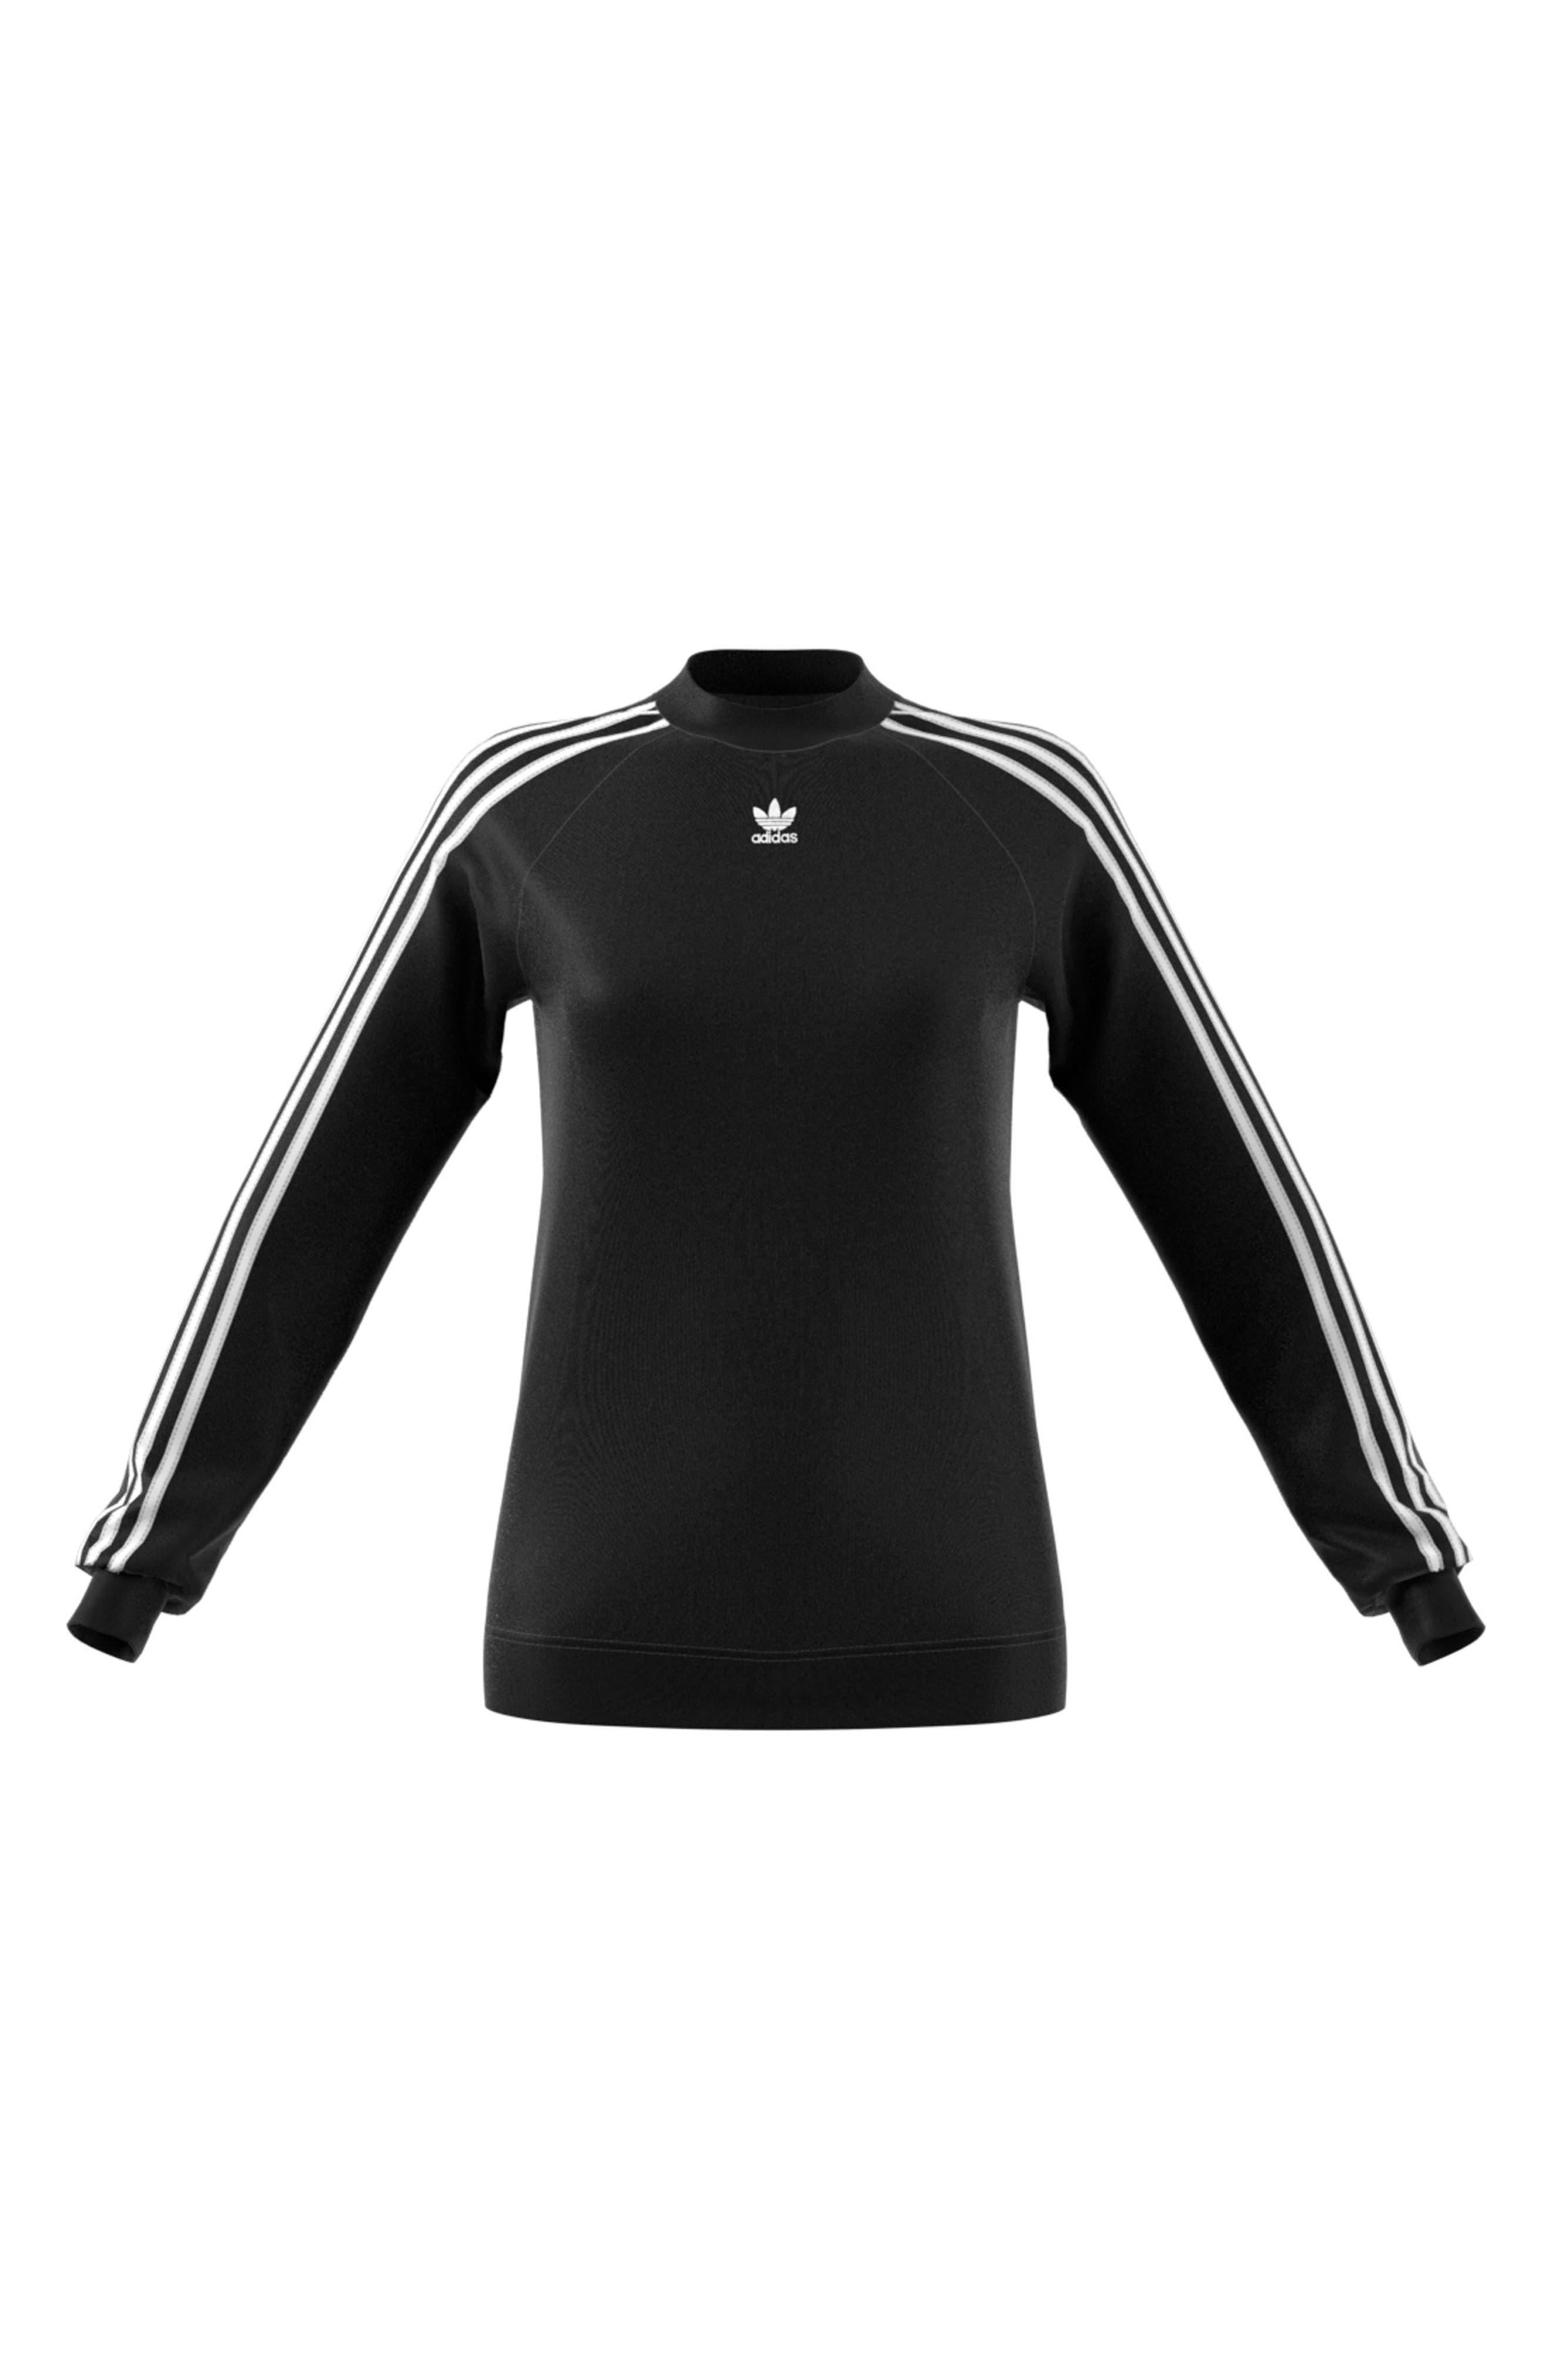 TRF Sweatshirt,                             Alternate thumbnail 6, color,                             BLACK